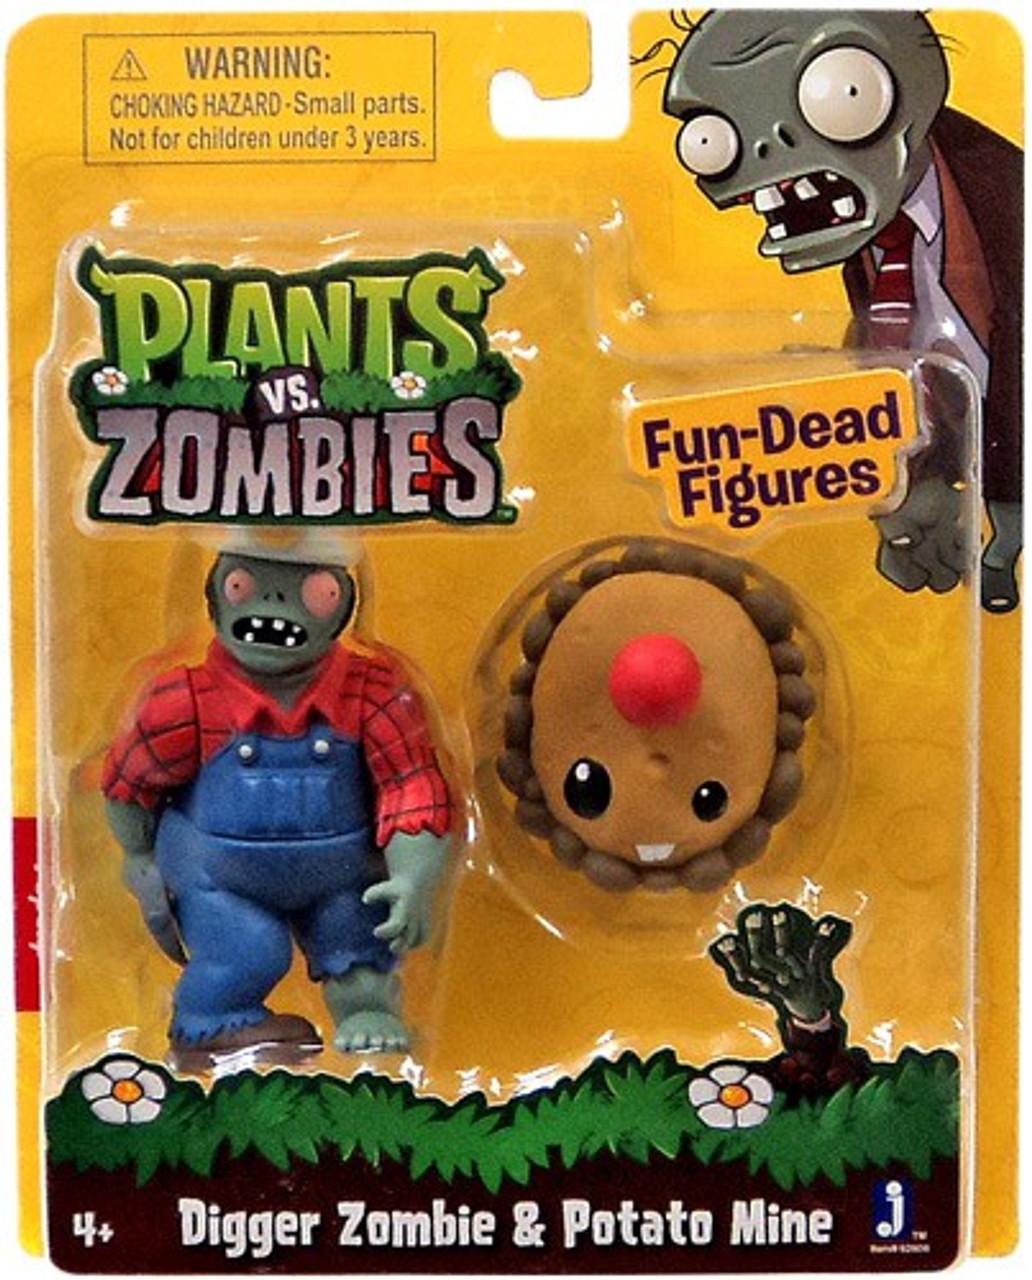 Plants vs. Zombies Fun-Dead Figures Digger Zombie & Potato Mine 3-Inch Figure 2-Pack